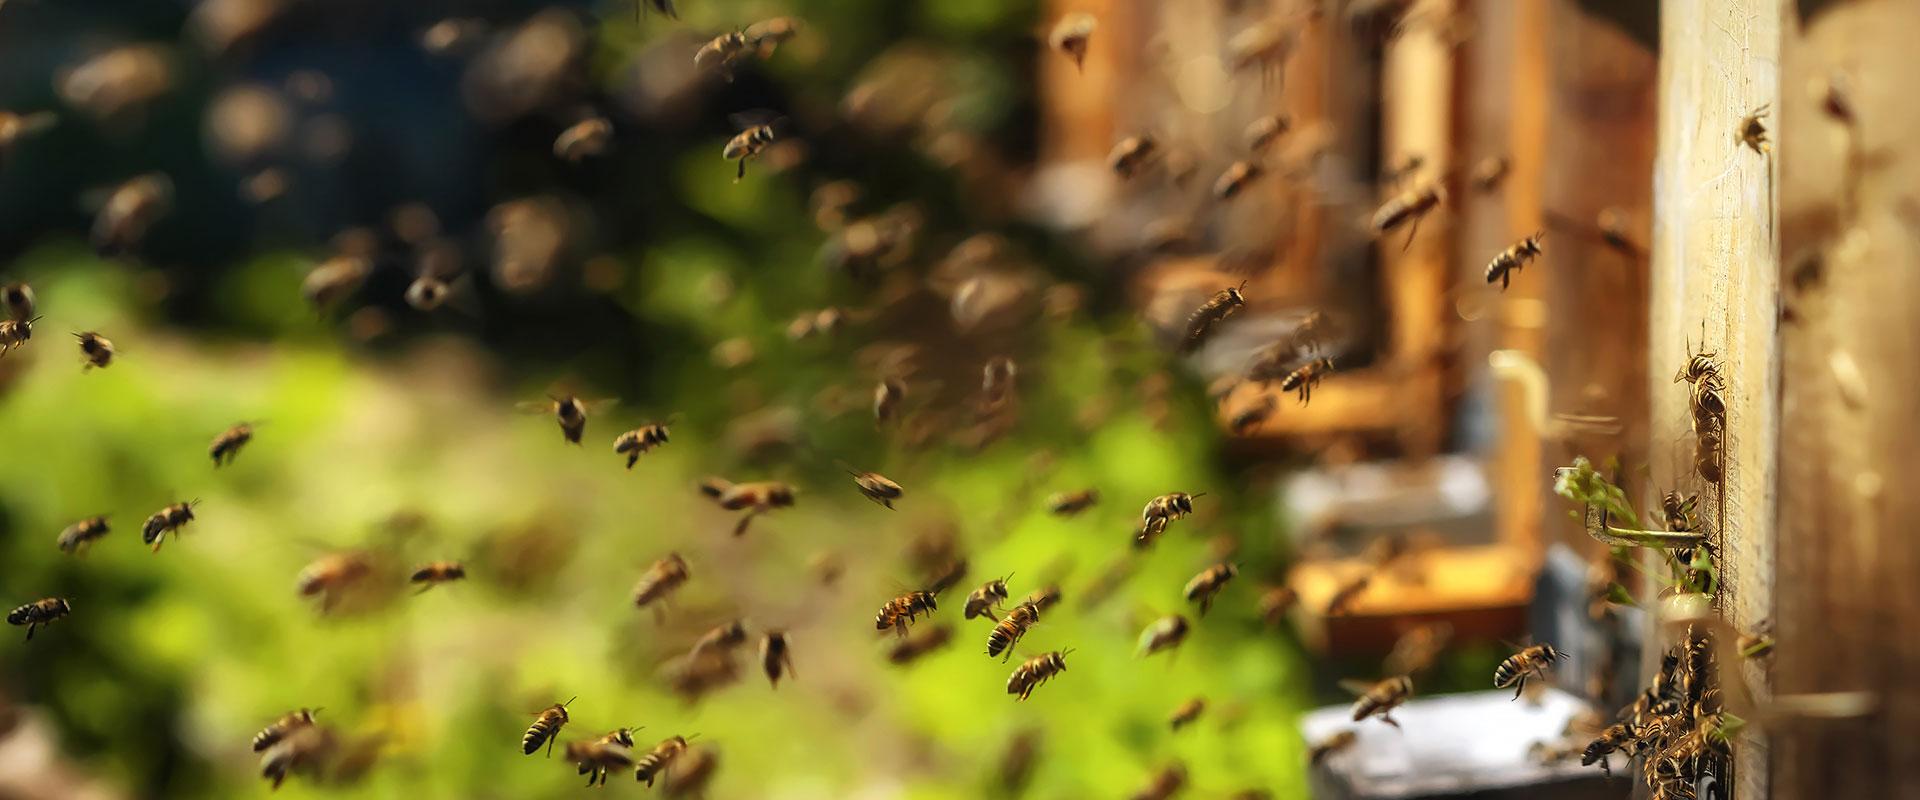 Honey Bees for Sale - Beekeeping Supplies - Bee Well Honey ... - photo#20